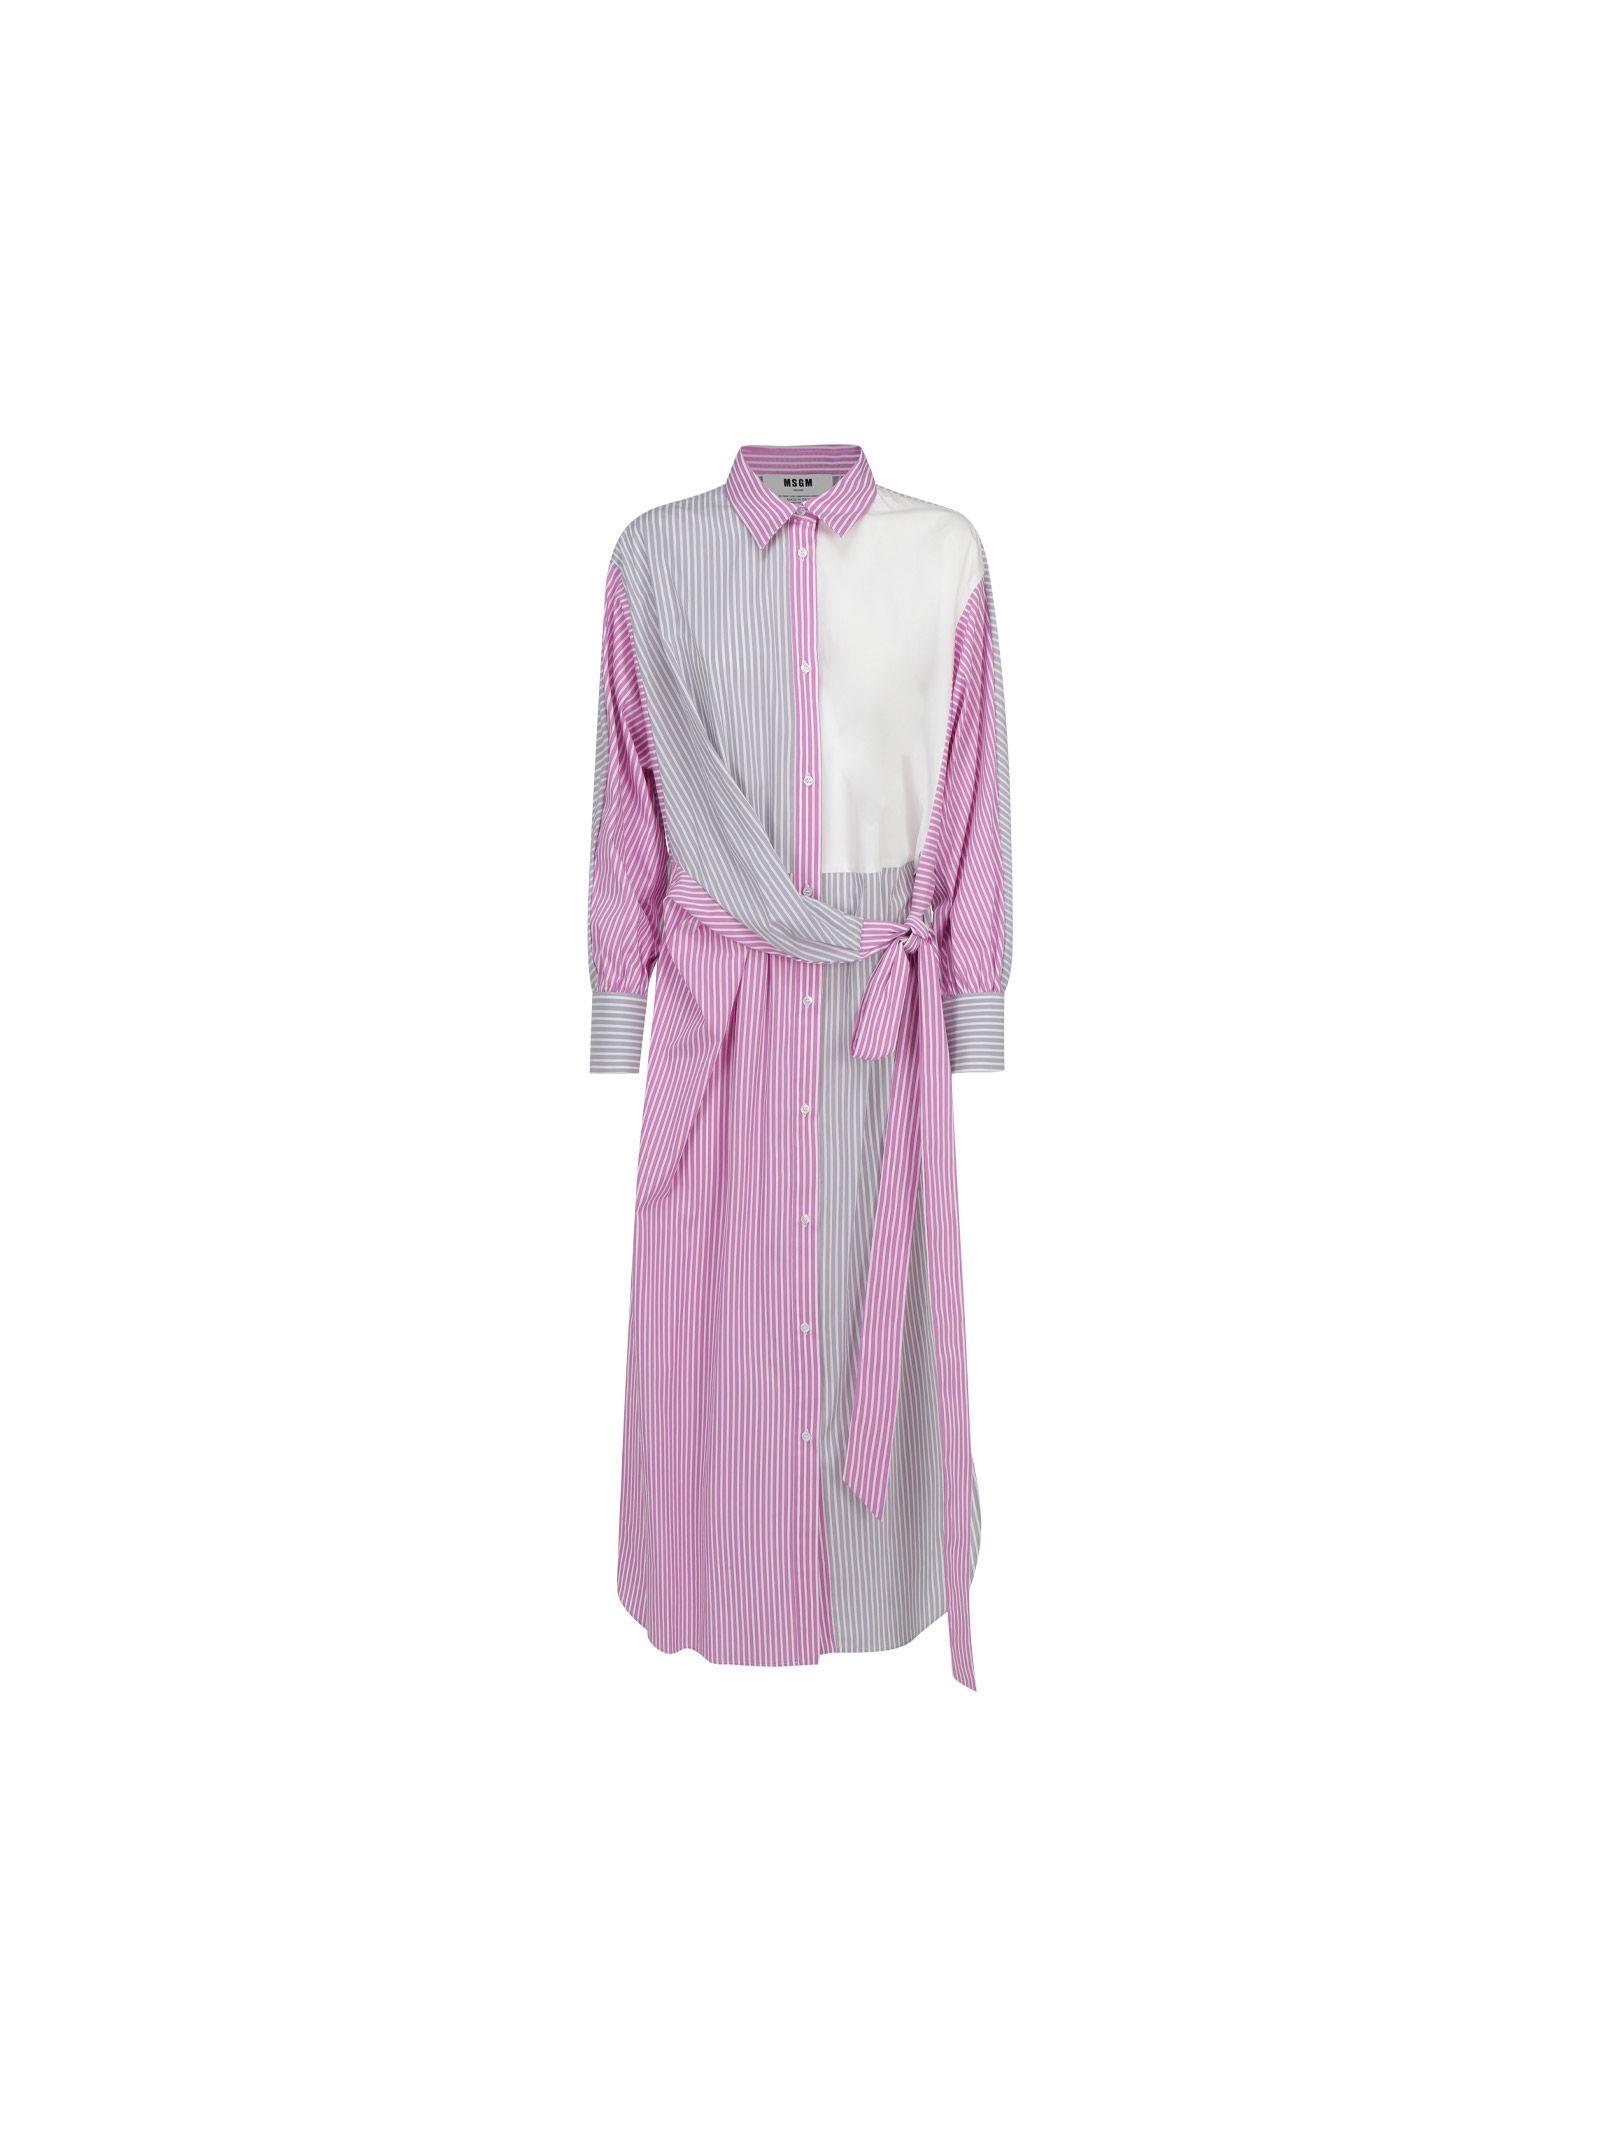 Msgm Downs MSGM WOMEN'S PINK COTTON DRESS